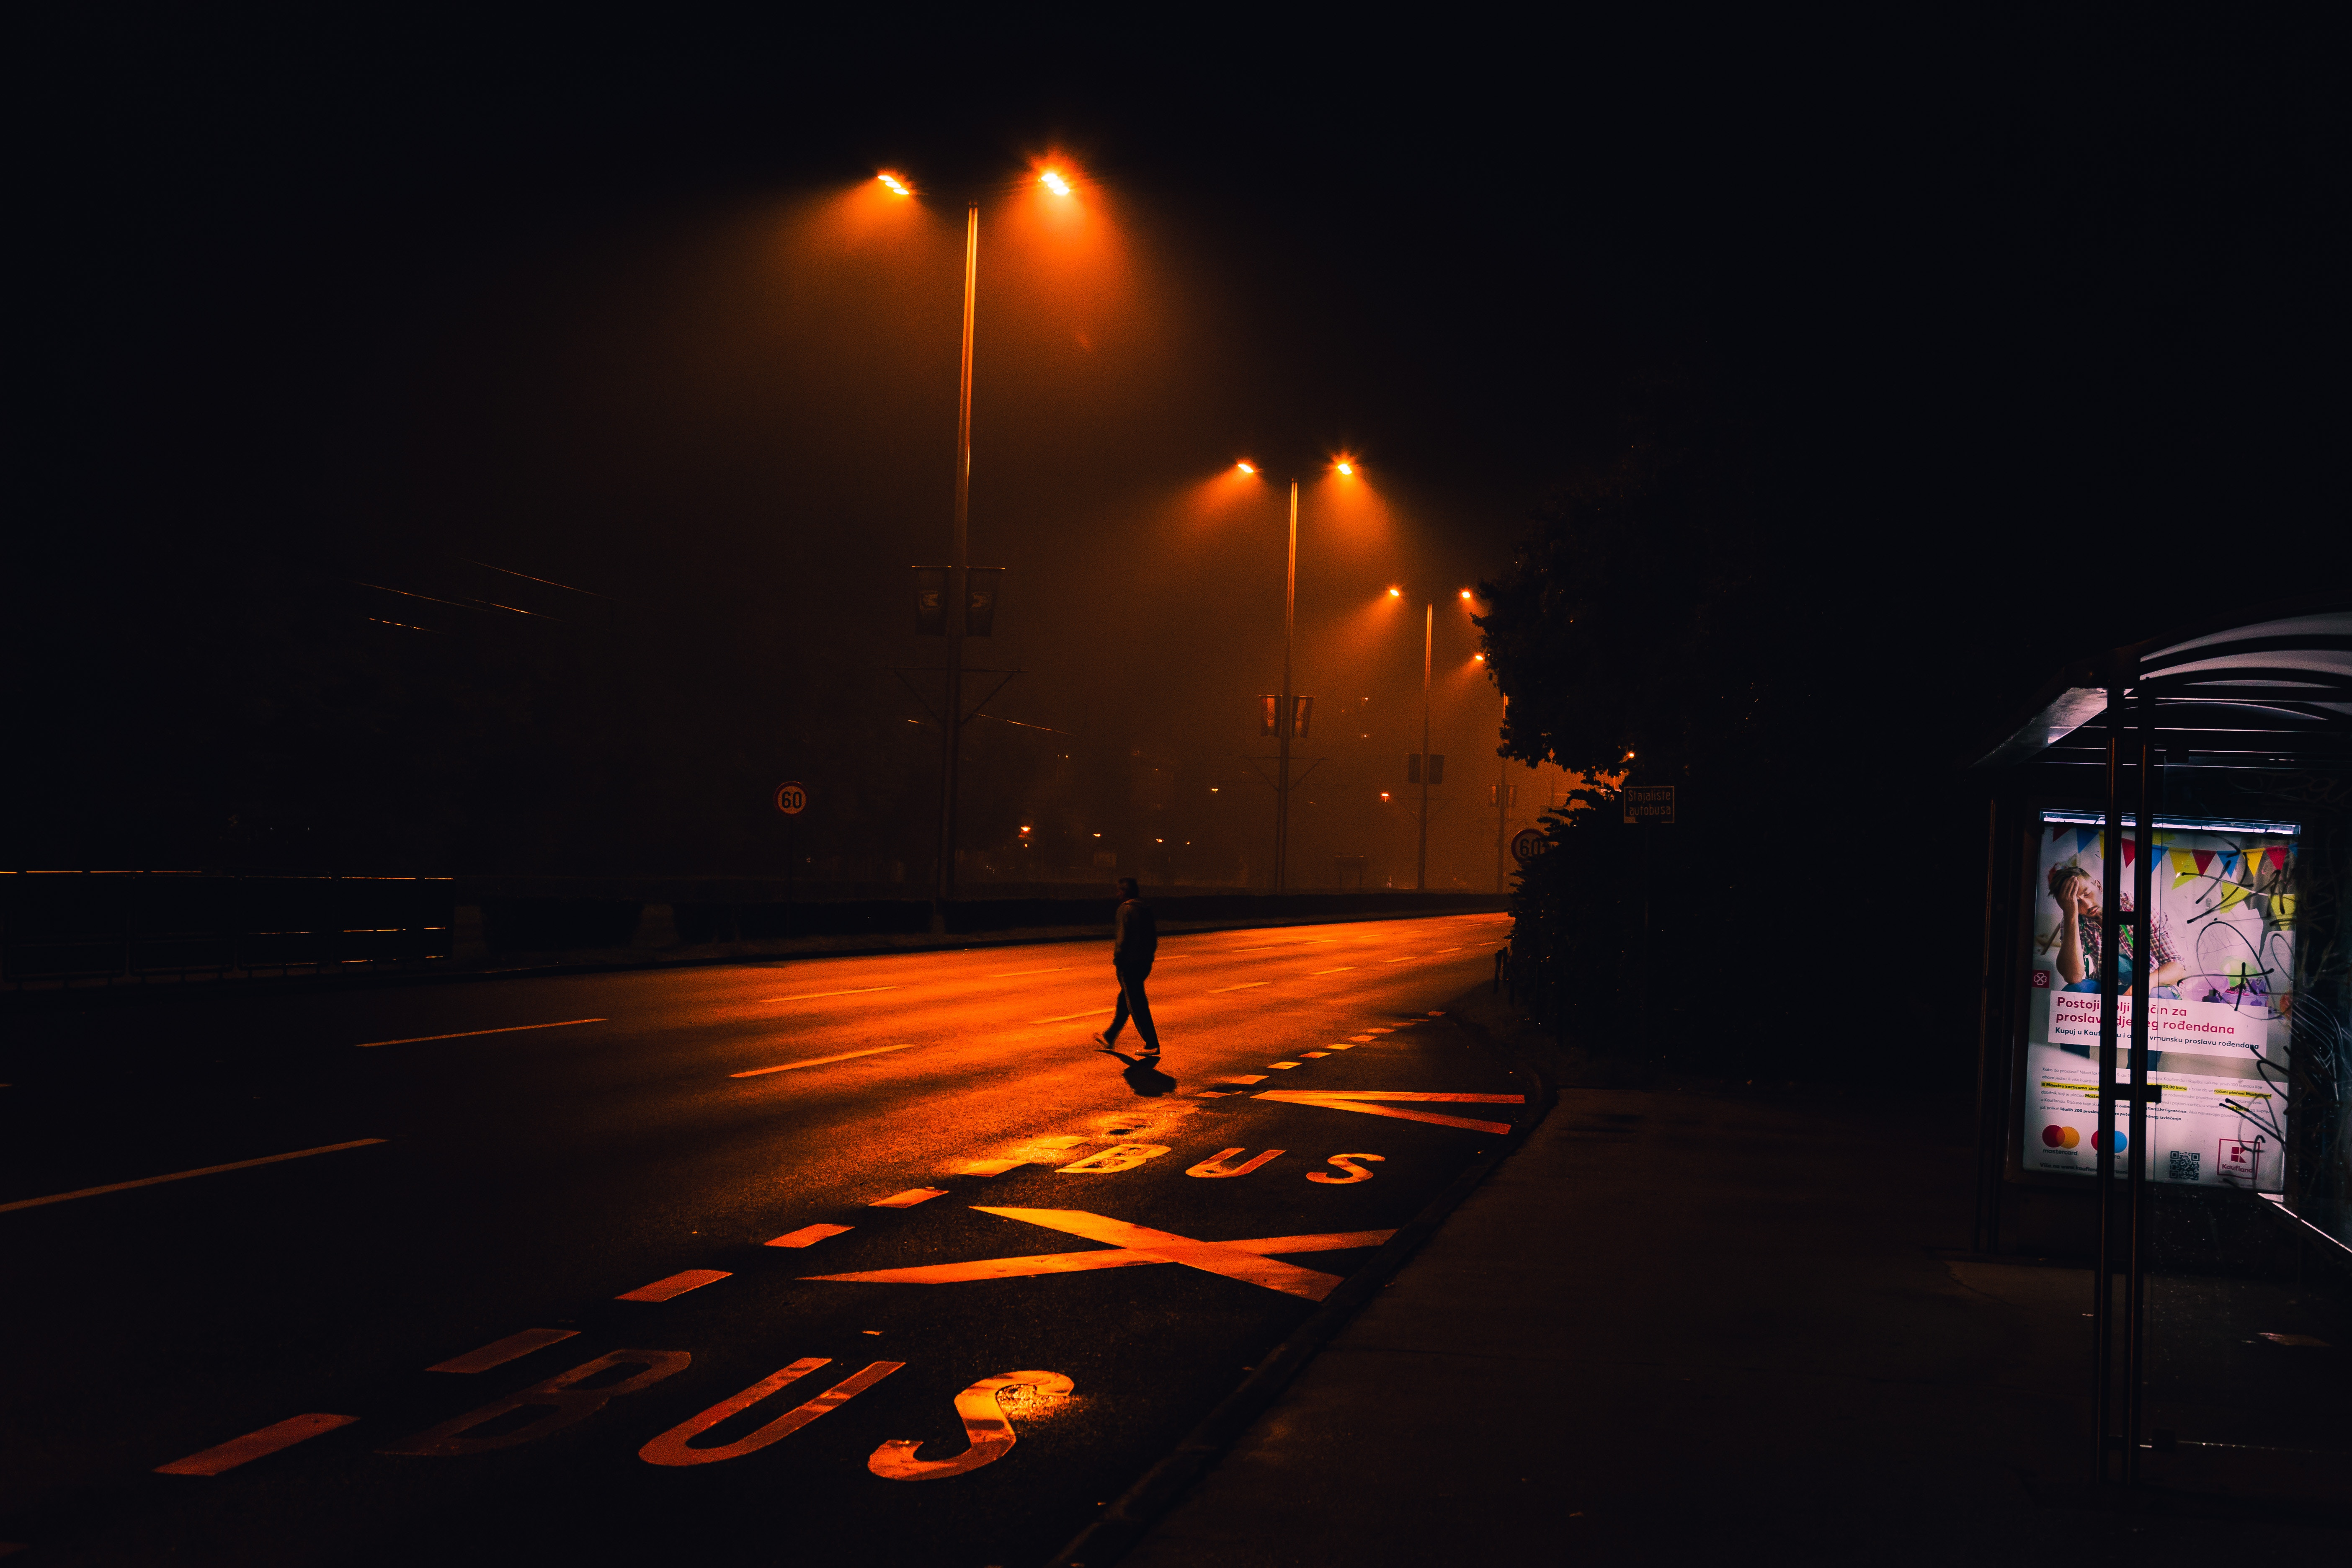 General 5616x3744 night street urban lights silhouette road lamp street light photography night view dark black Croatia